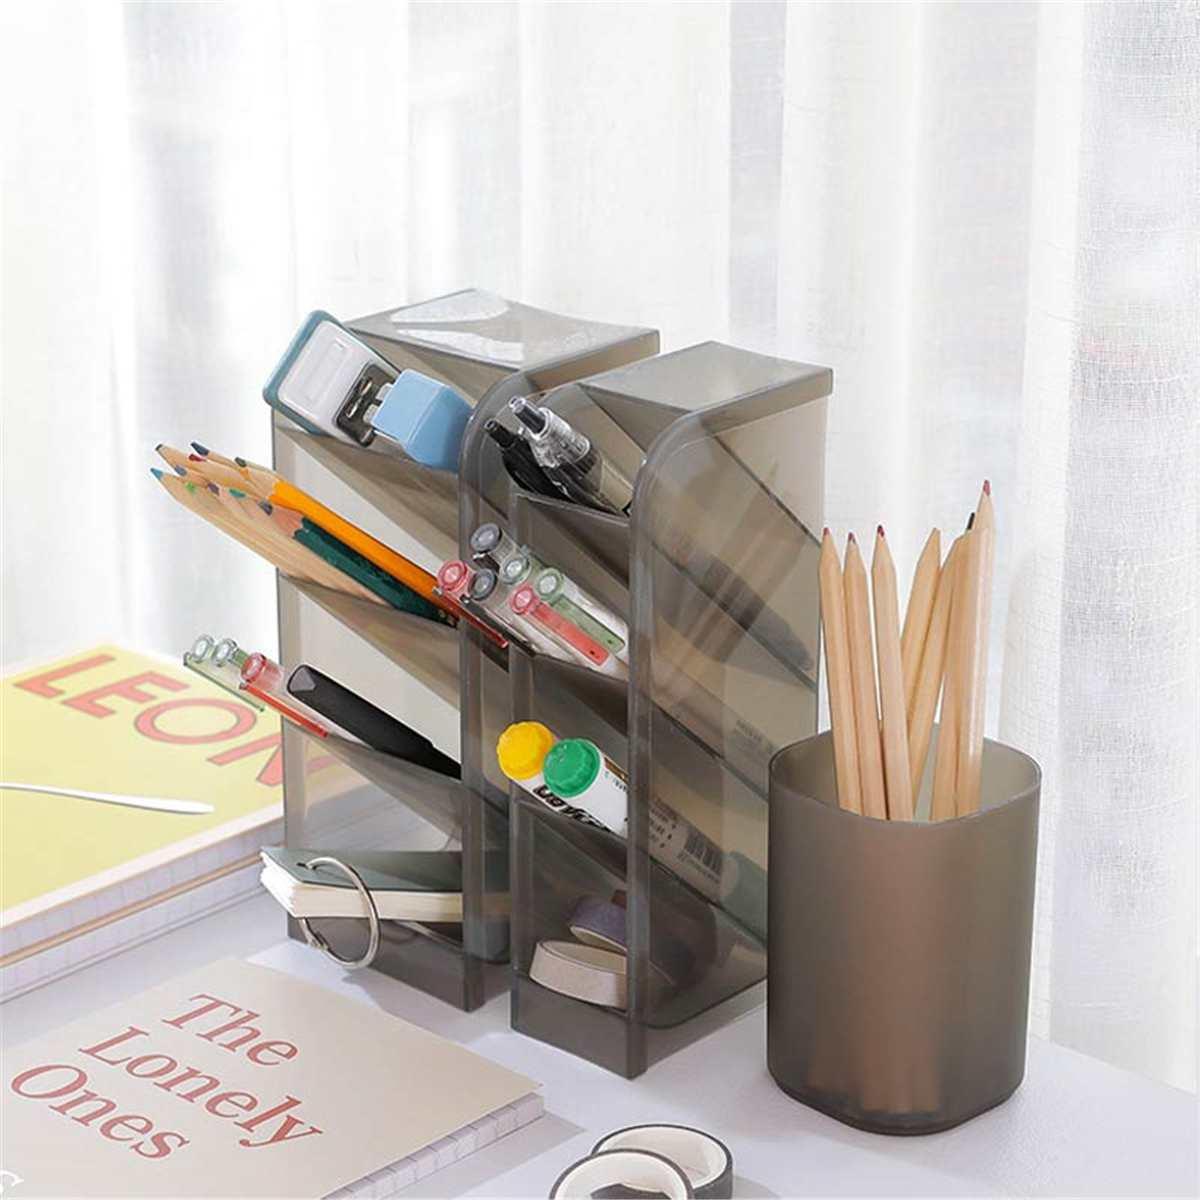 Home Storage Organizer Pencil Tube Home Office Supplies Pencil Cosmetic Pot Pen Holder Stationery Storage Rack Desktop Storage